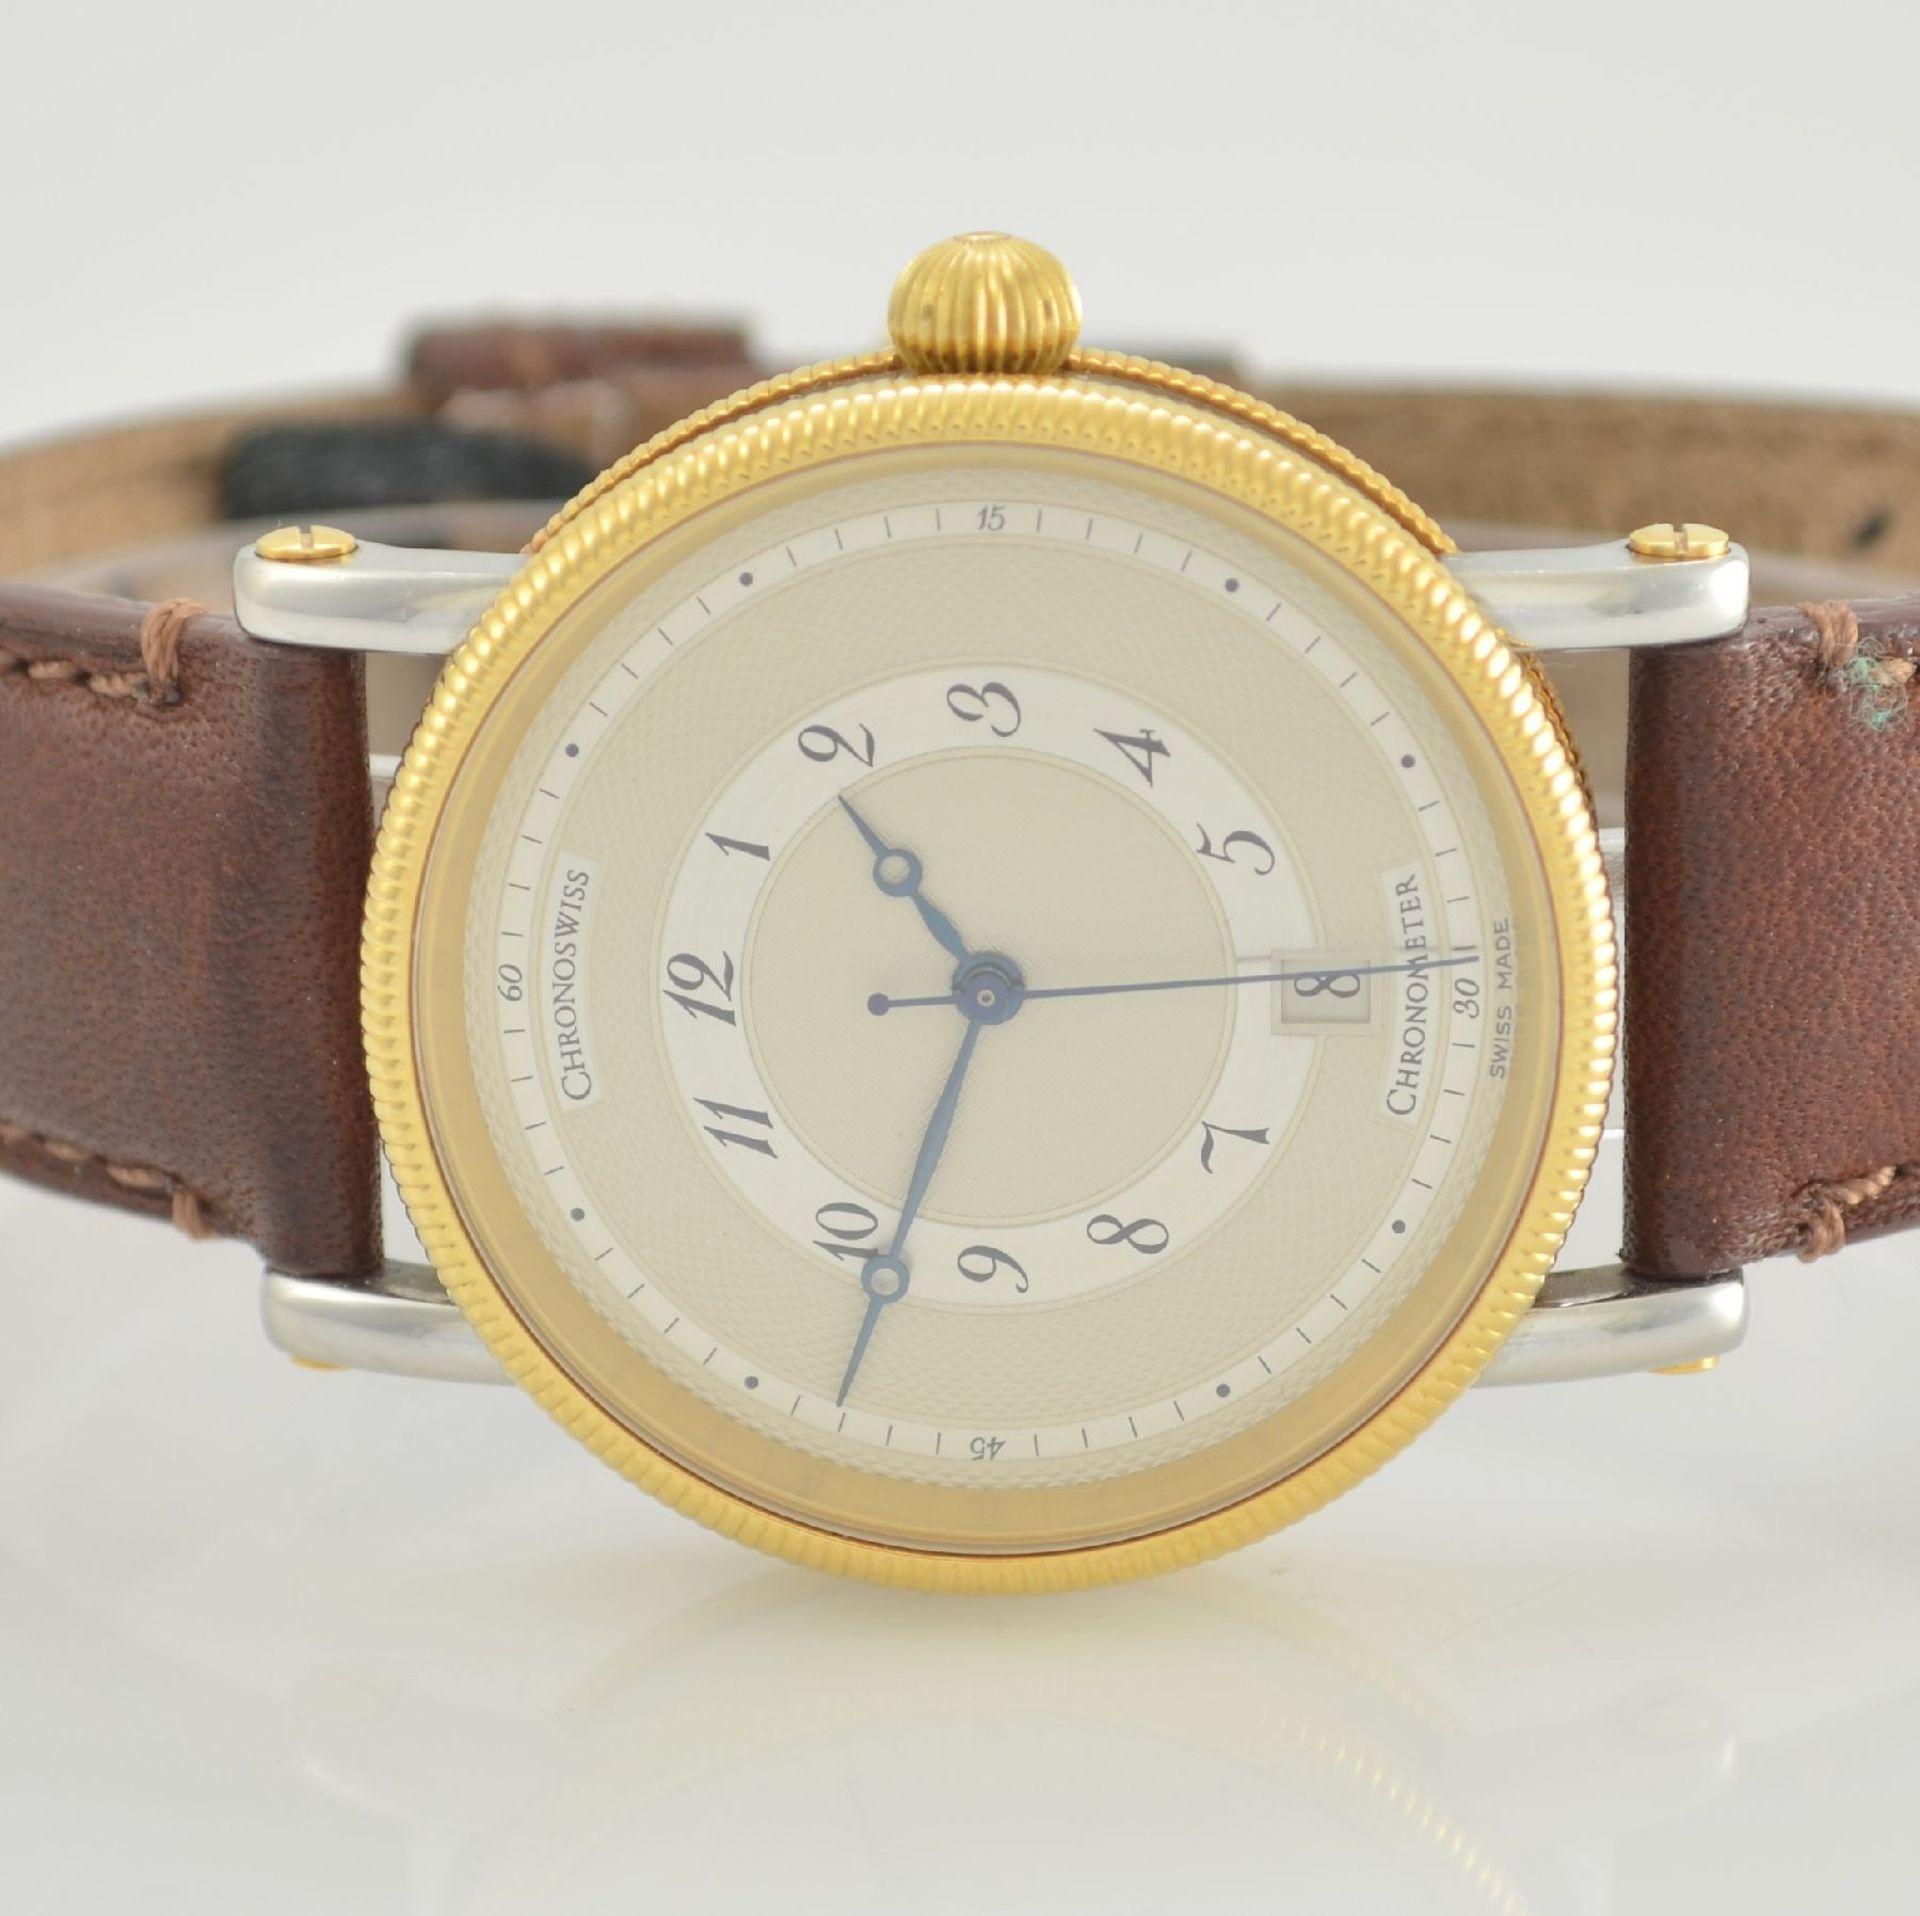 CHRONOSWISS Chronometer Herrenarmbanduhr, Automatik, Ref. CH 2822, Edelstahl/Gold kombiniert inkl. - Bild 2 aus 7